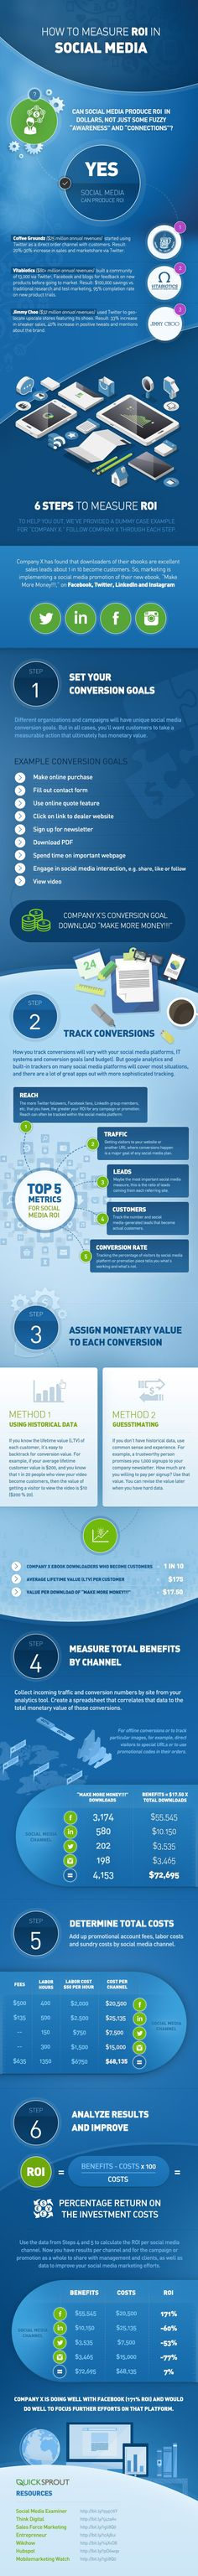 How to Measure #ROI in #SocialMedia [#infographic]